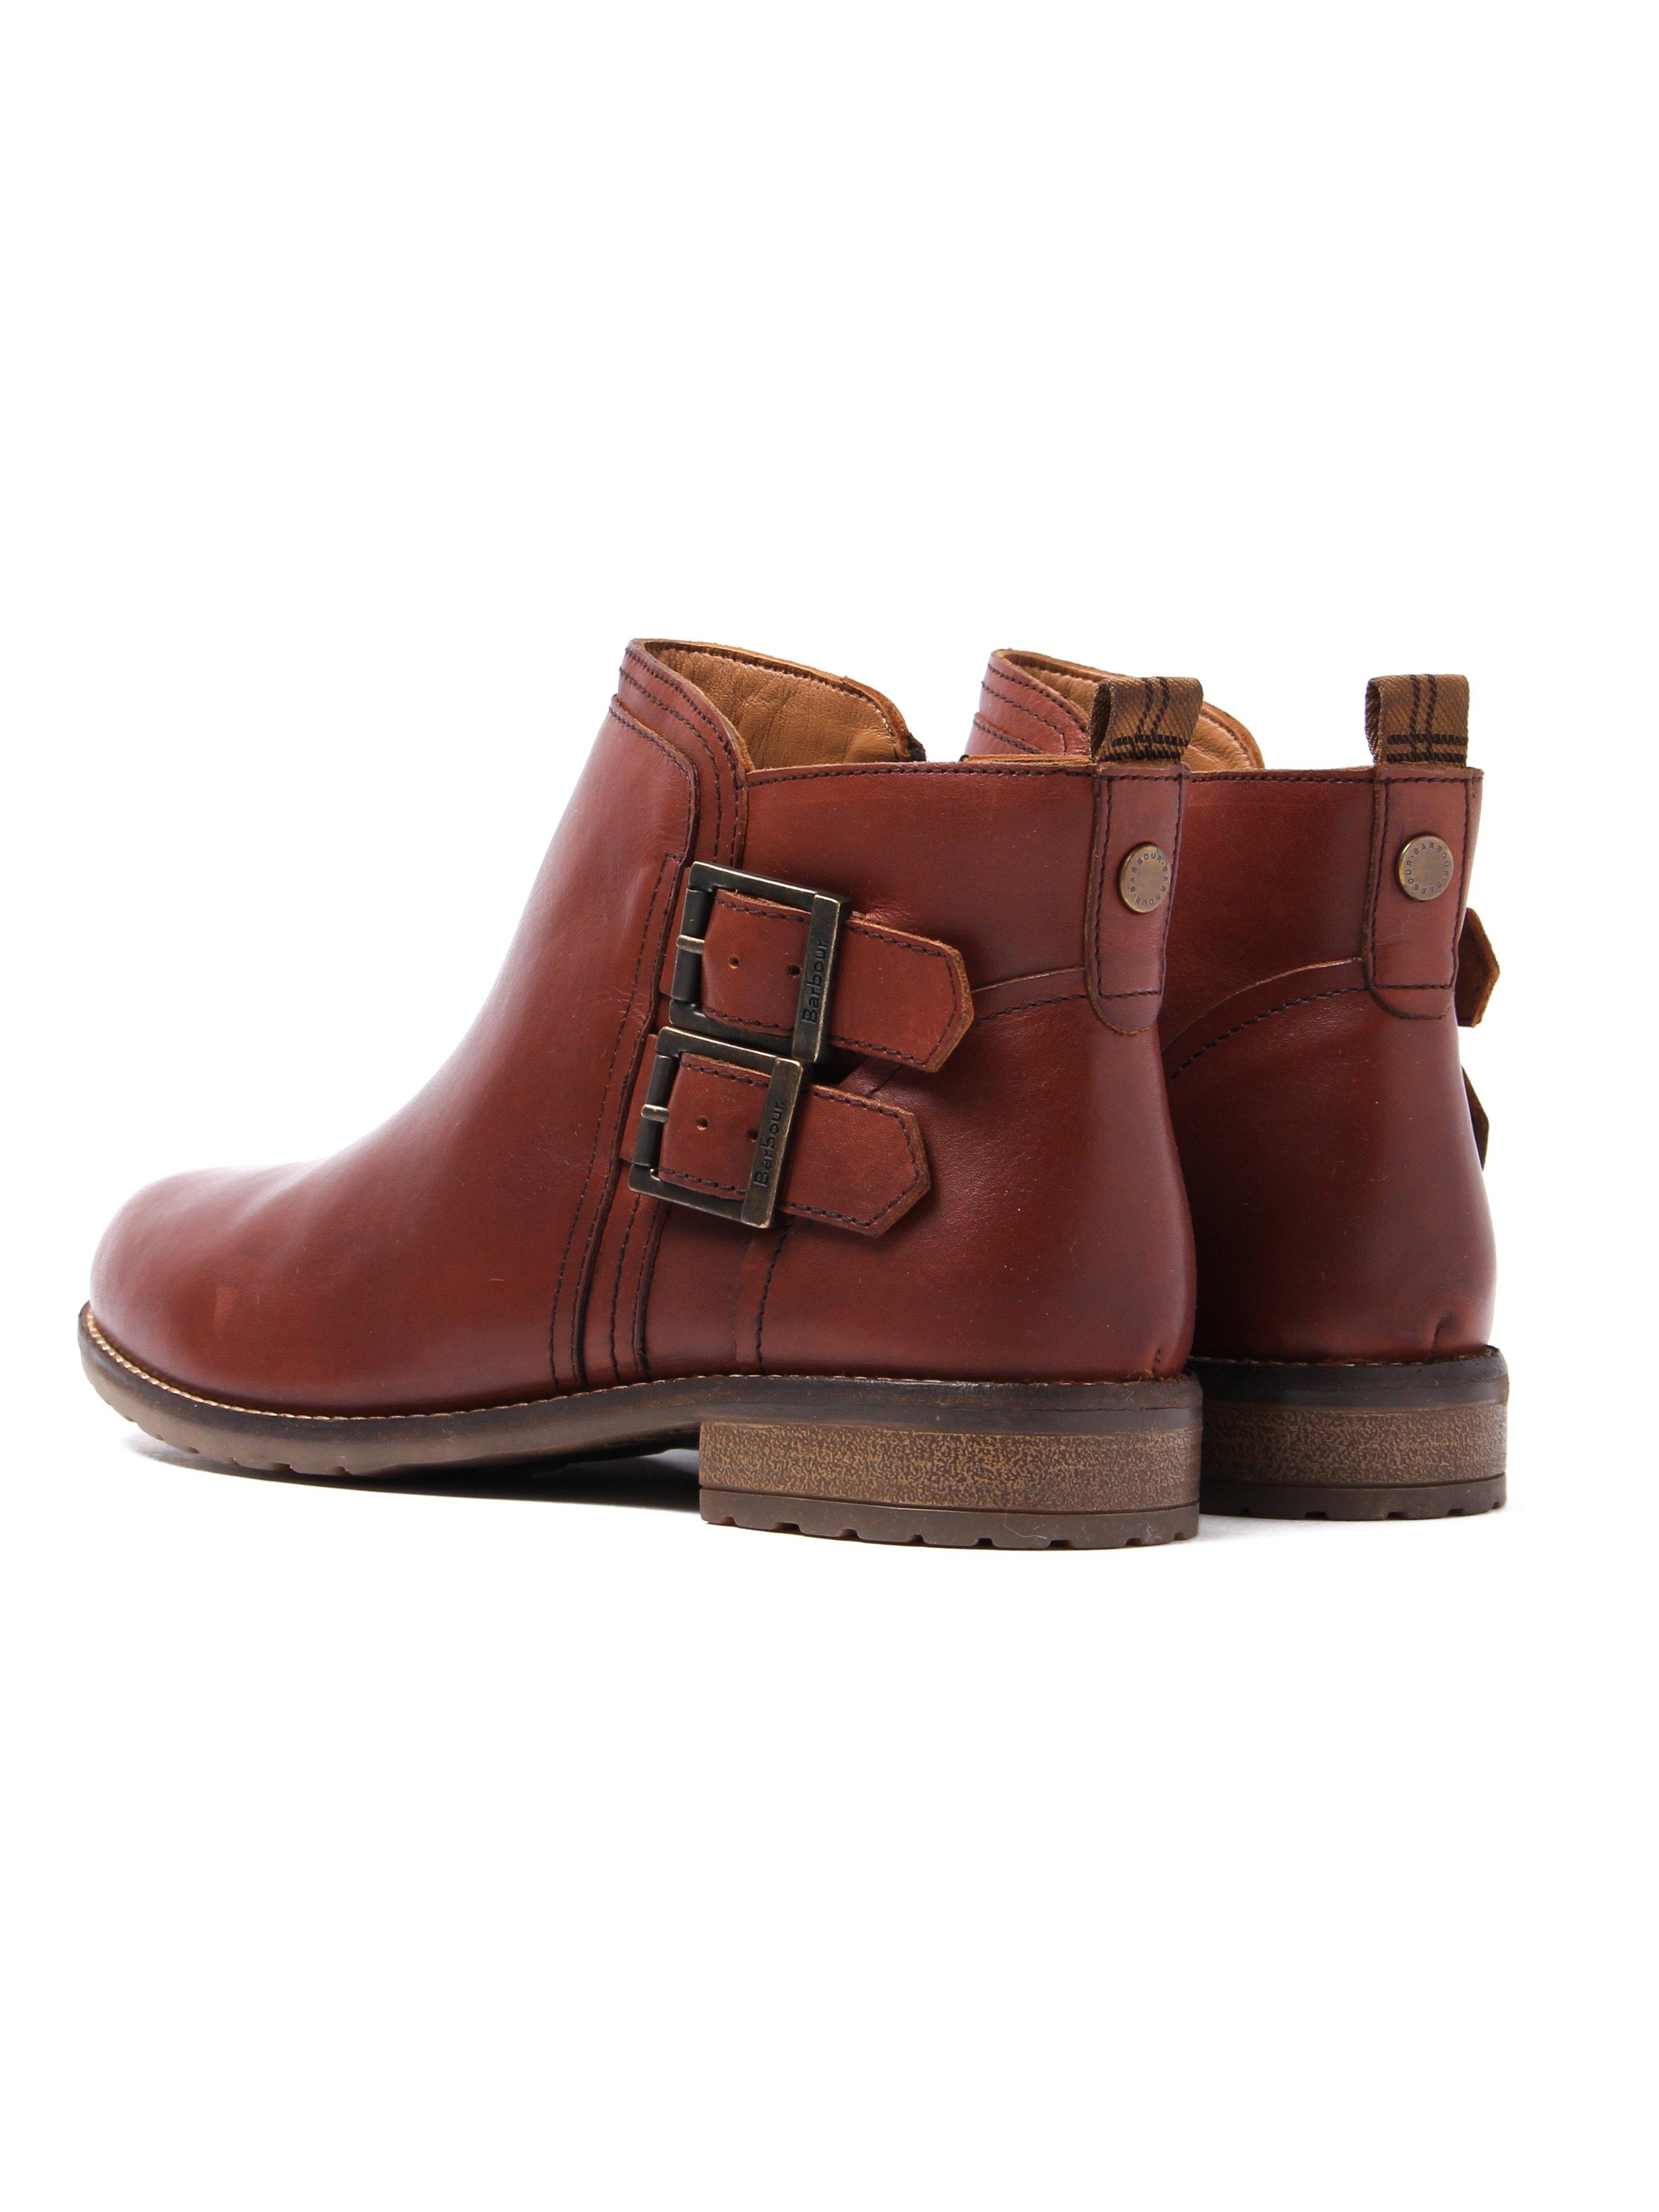 Barbour Women's Sarah Low Buckle Boots - Chestnut Leather